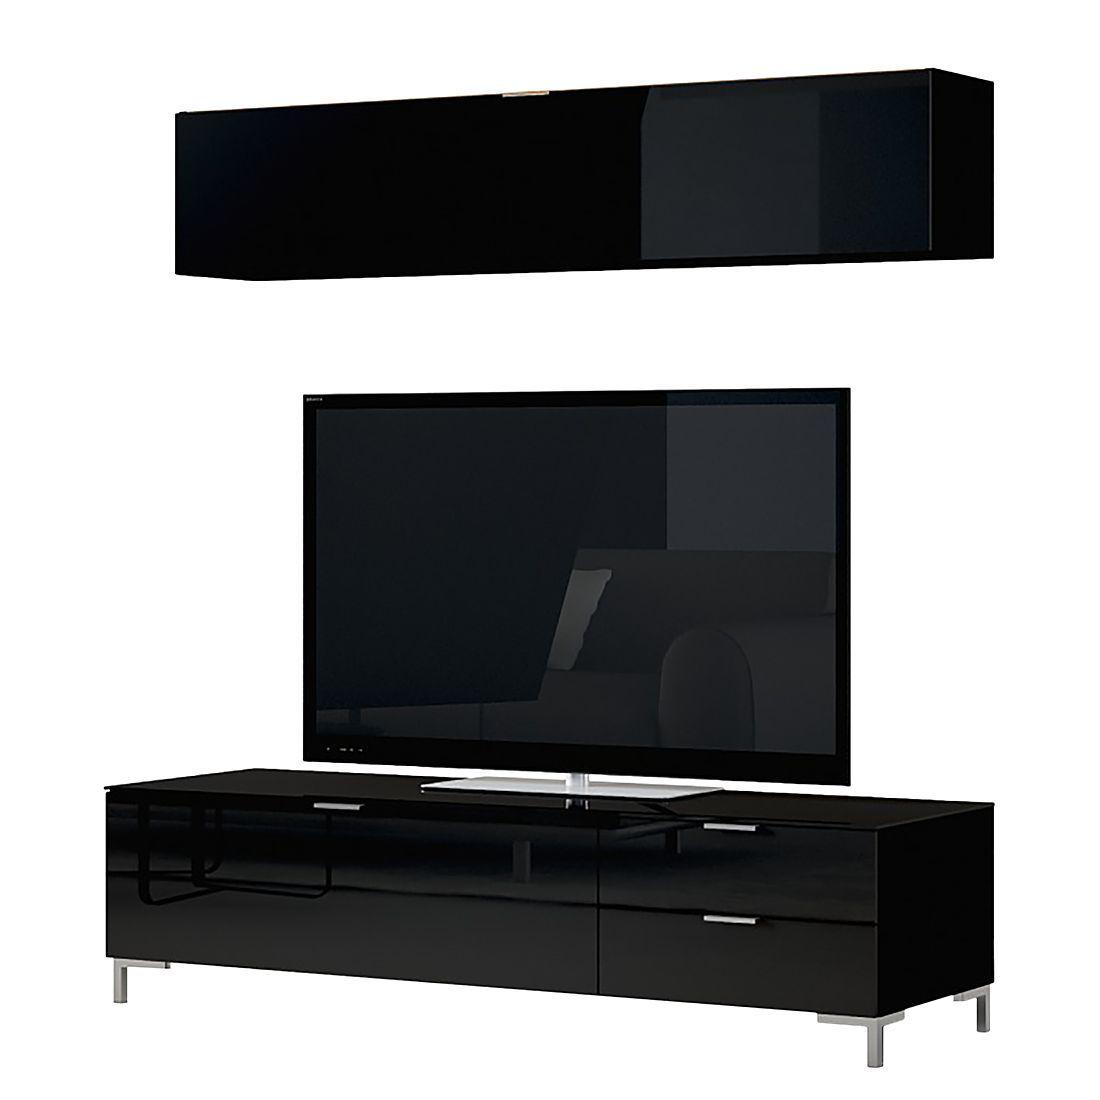 wohnwand 2 50 m wstmann azteka wohnwand with wohnwand 2 50 m elegant wohnwand with wohnwand 2. Black Bedroom Furniture Sets. Home Design Ideas